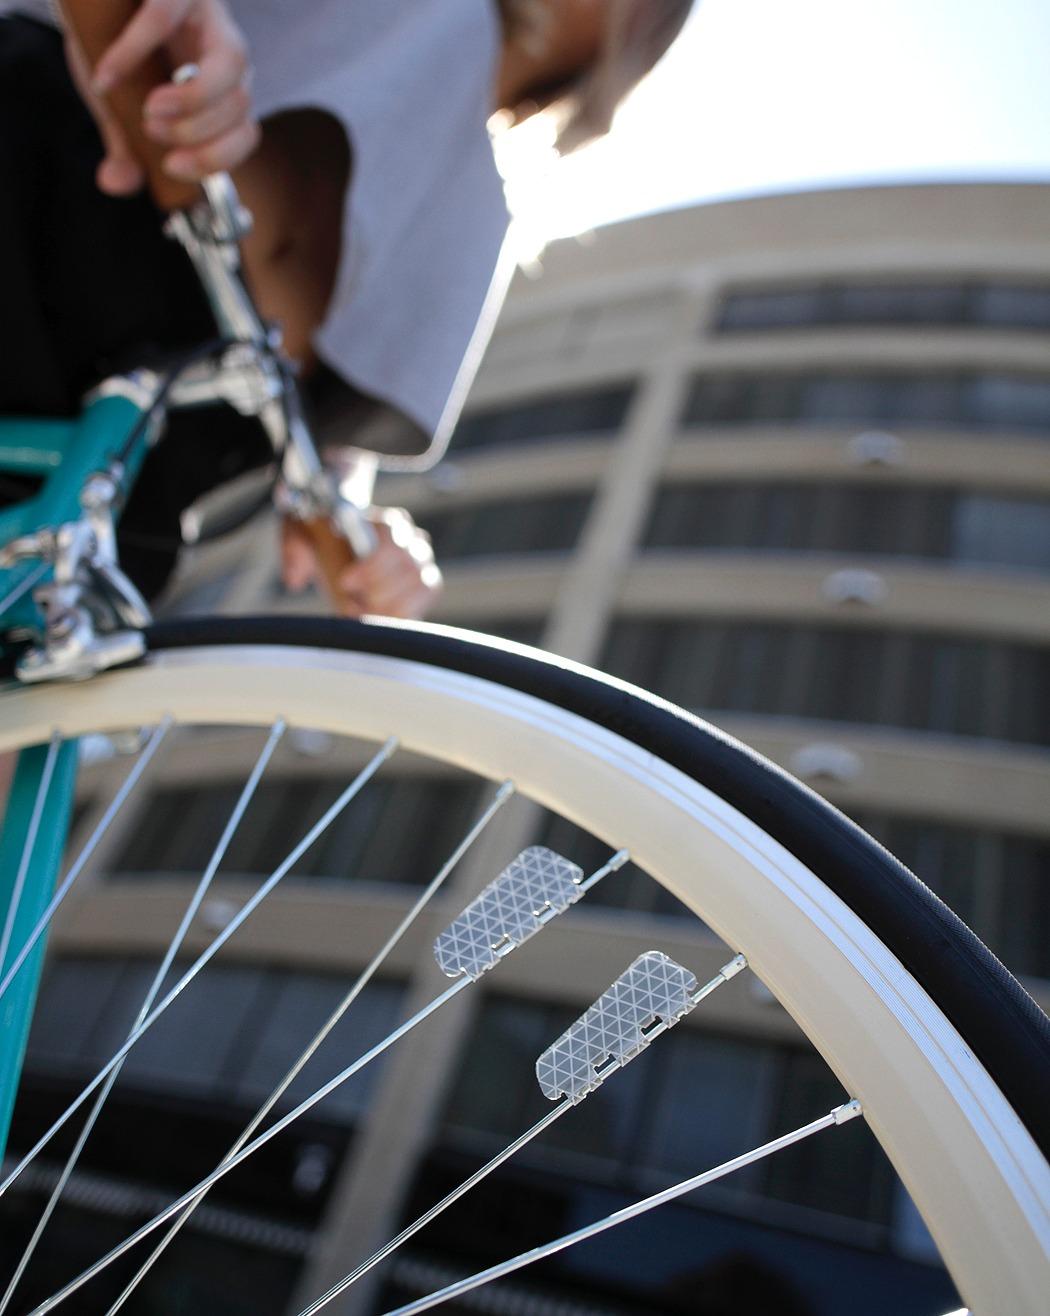 flectr_bike_reflector_07